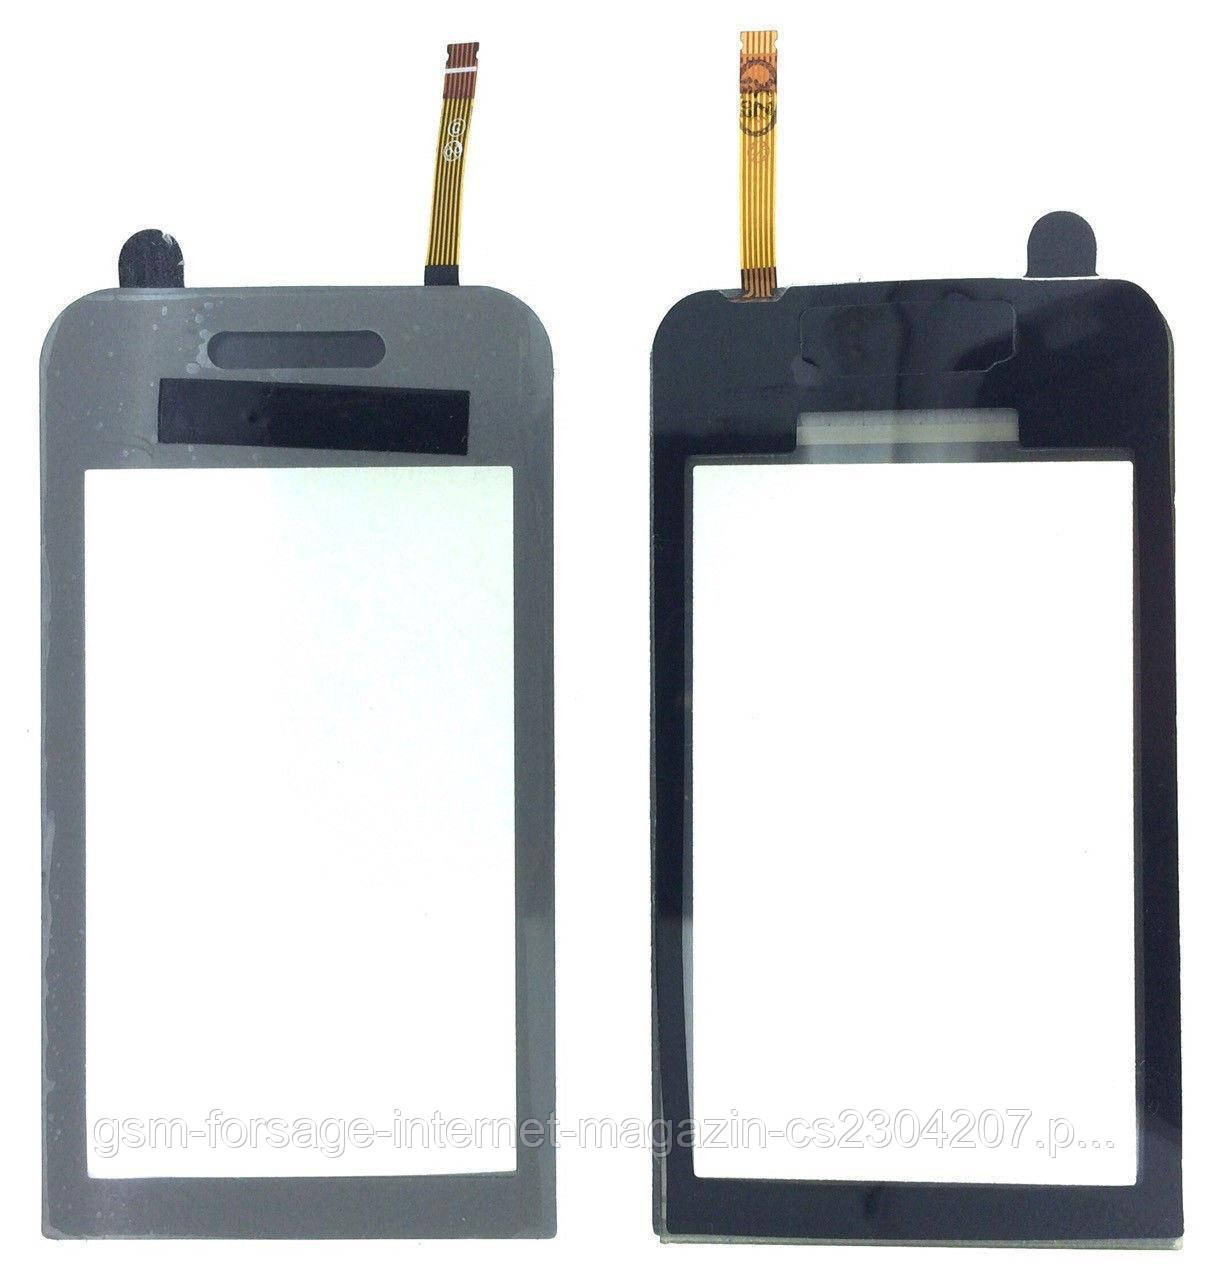 Тачскрин Samsung S5230 Silver с самоклейкой